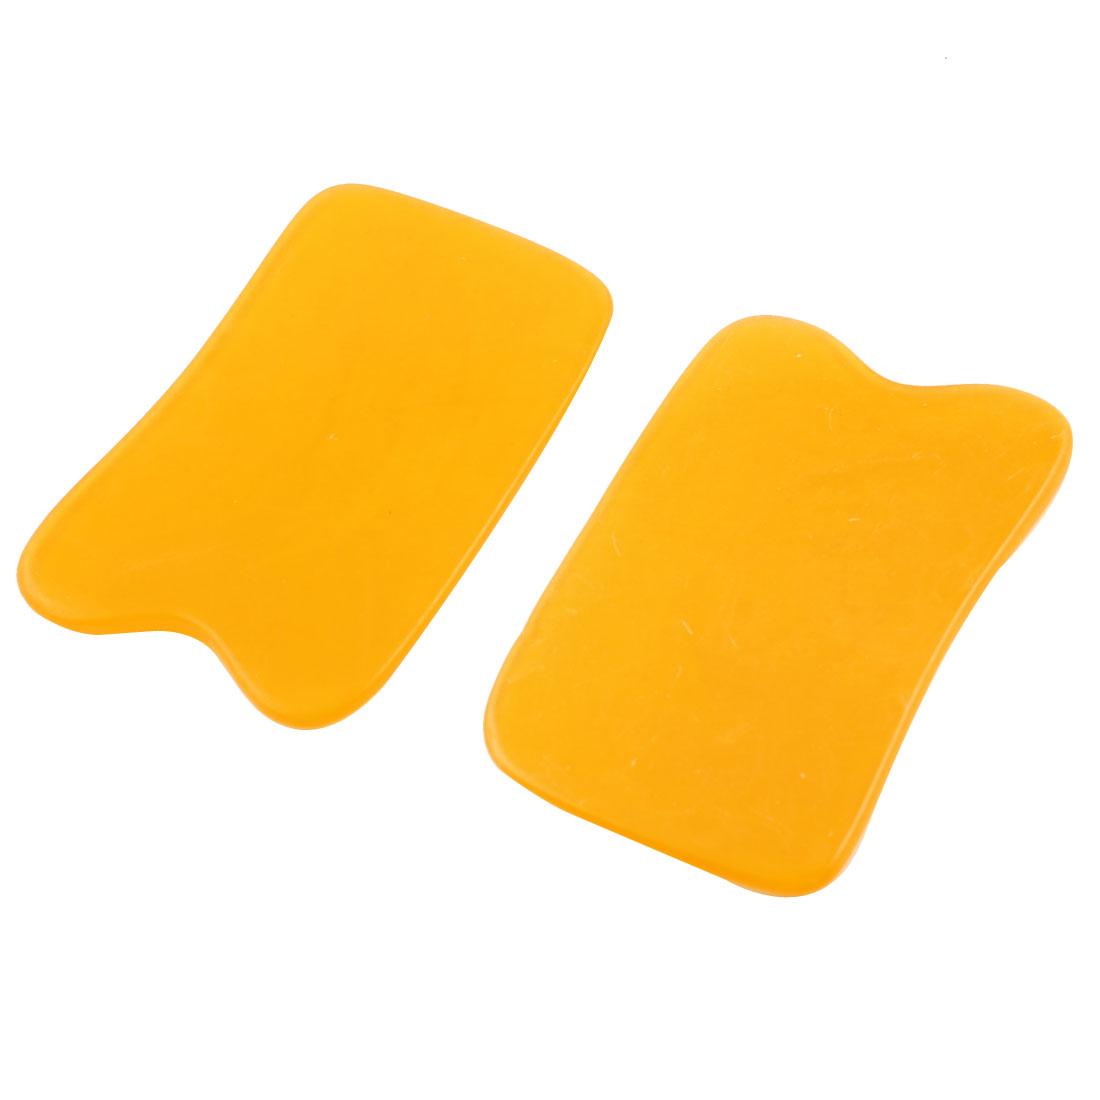 Handy Orange Body Back Guasha Traditional Massage Board Tool 2 Pcs